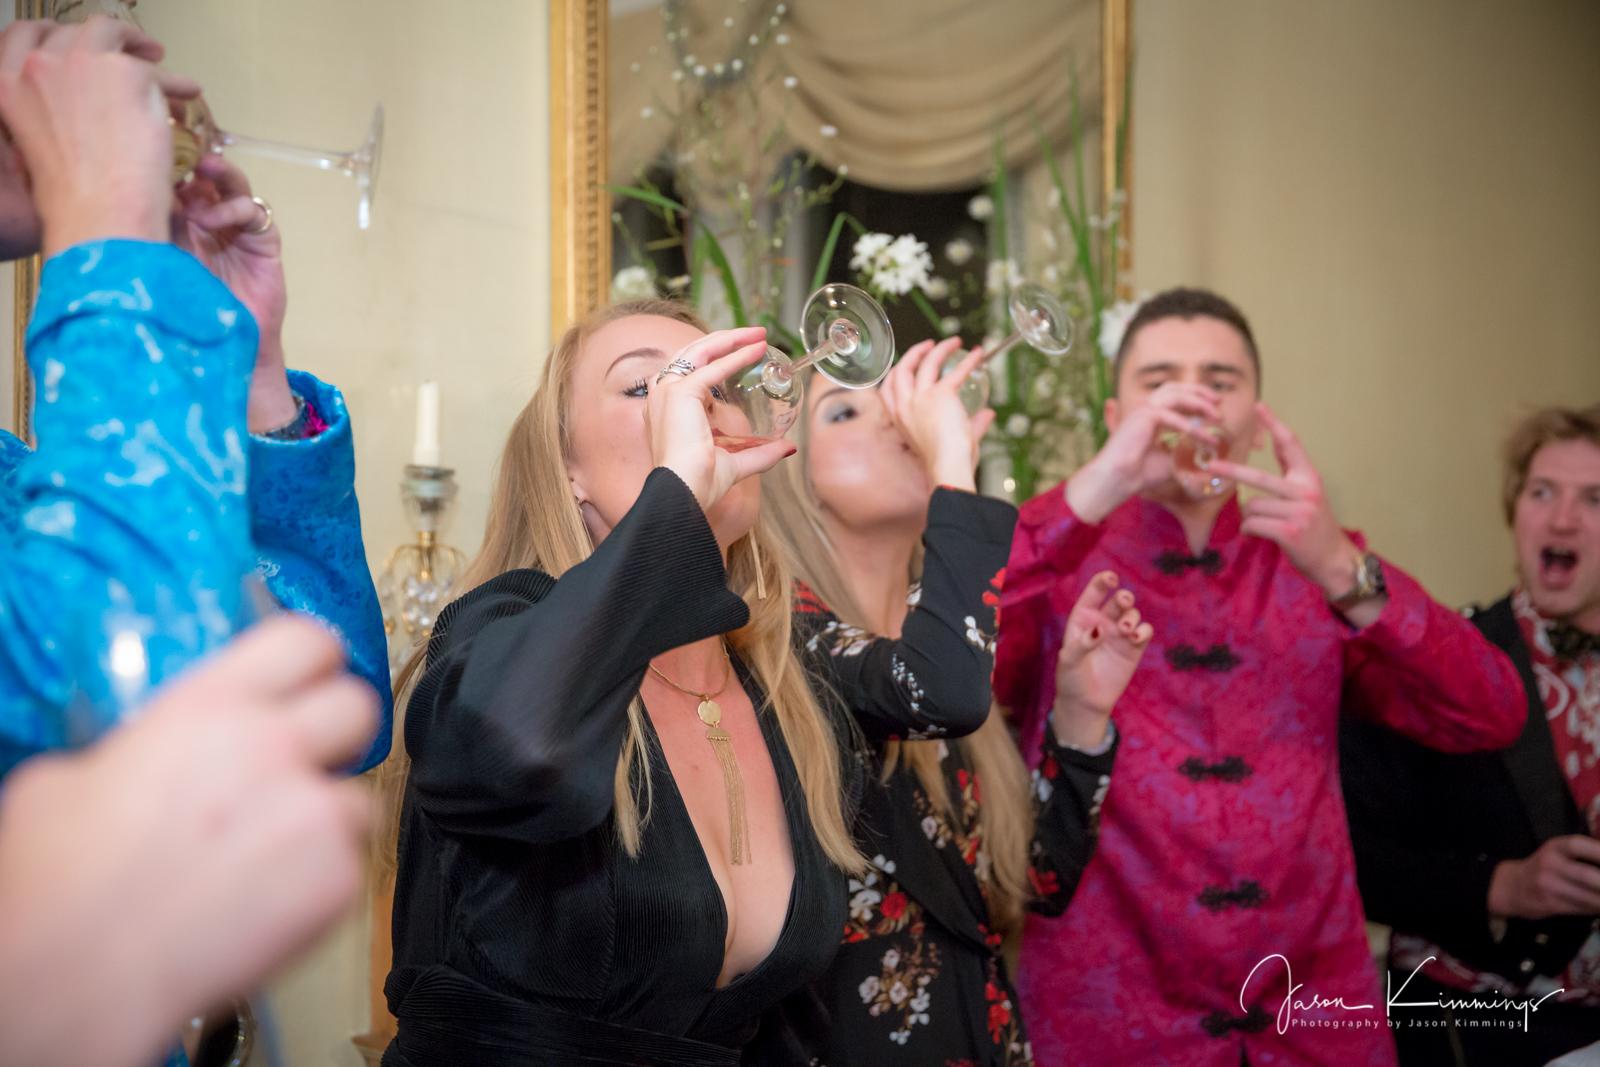 Party-event-photography-west-lothian-edinburgh-glasgow-19.jpg